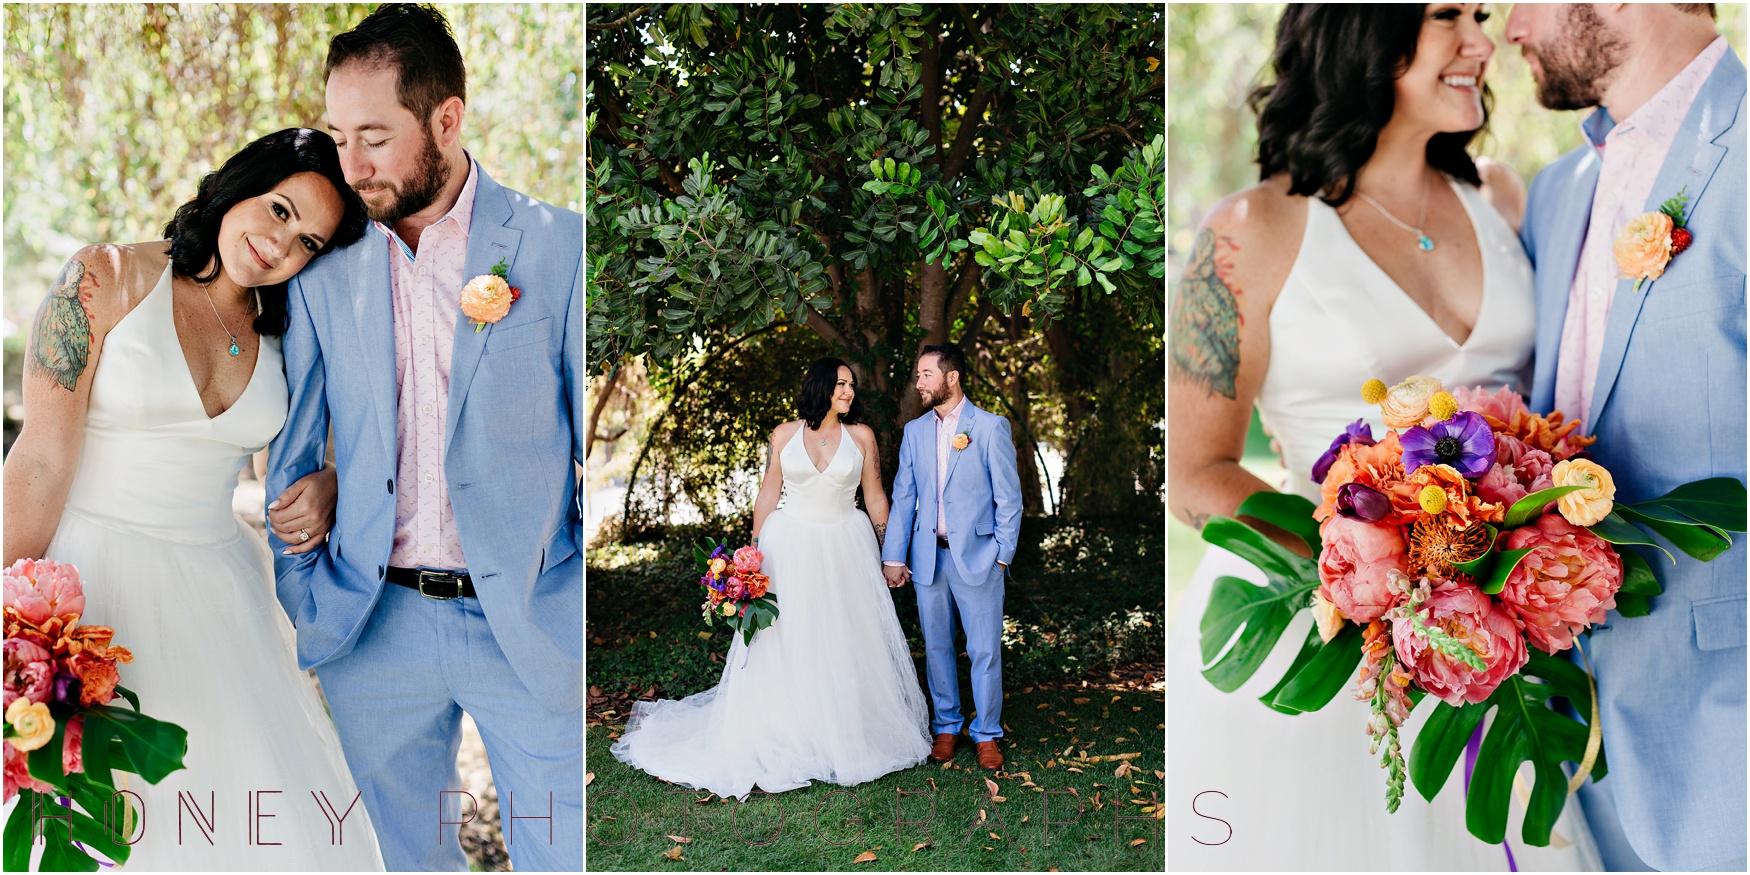 colorful_ecclectic_vibrant_vista_rainbow_quirky_wedding028.jpg